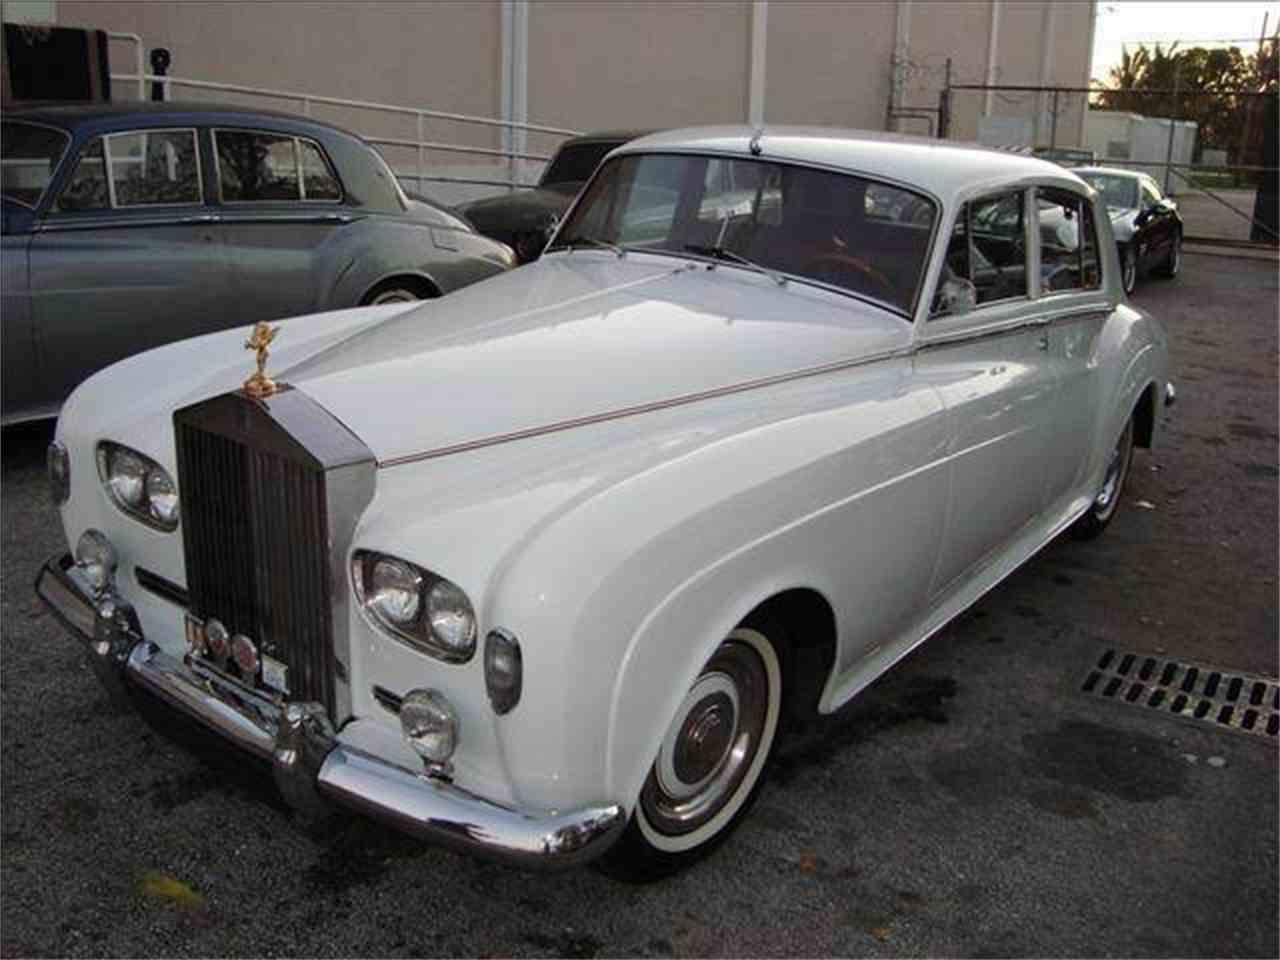 1965 rolls royce silver cloud iii for sale cc 653129. Black Bedroom Furniture Sets. Home Design Ideas